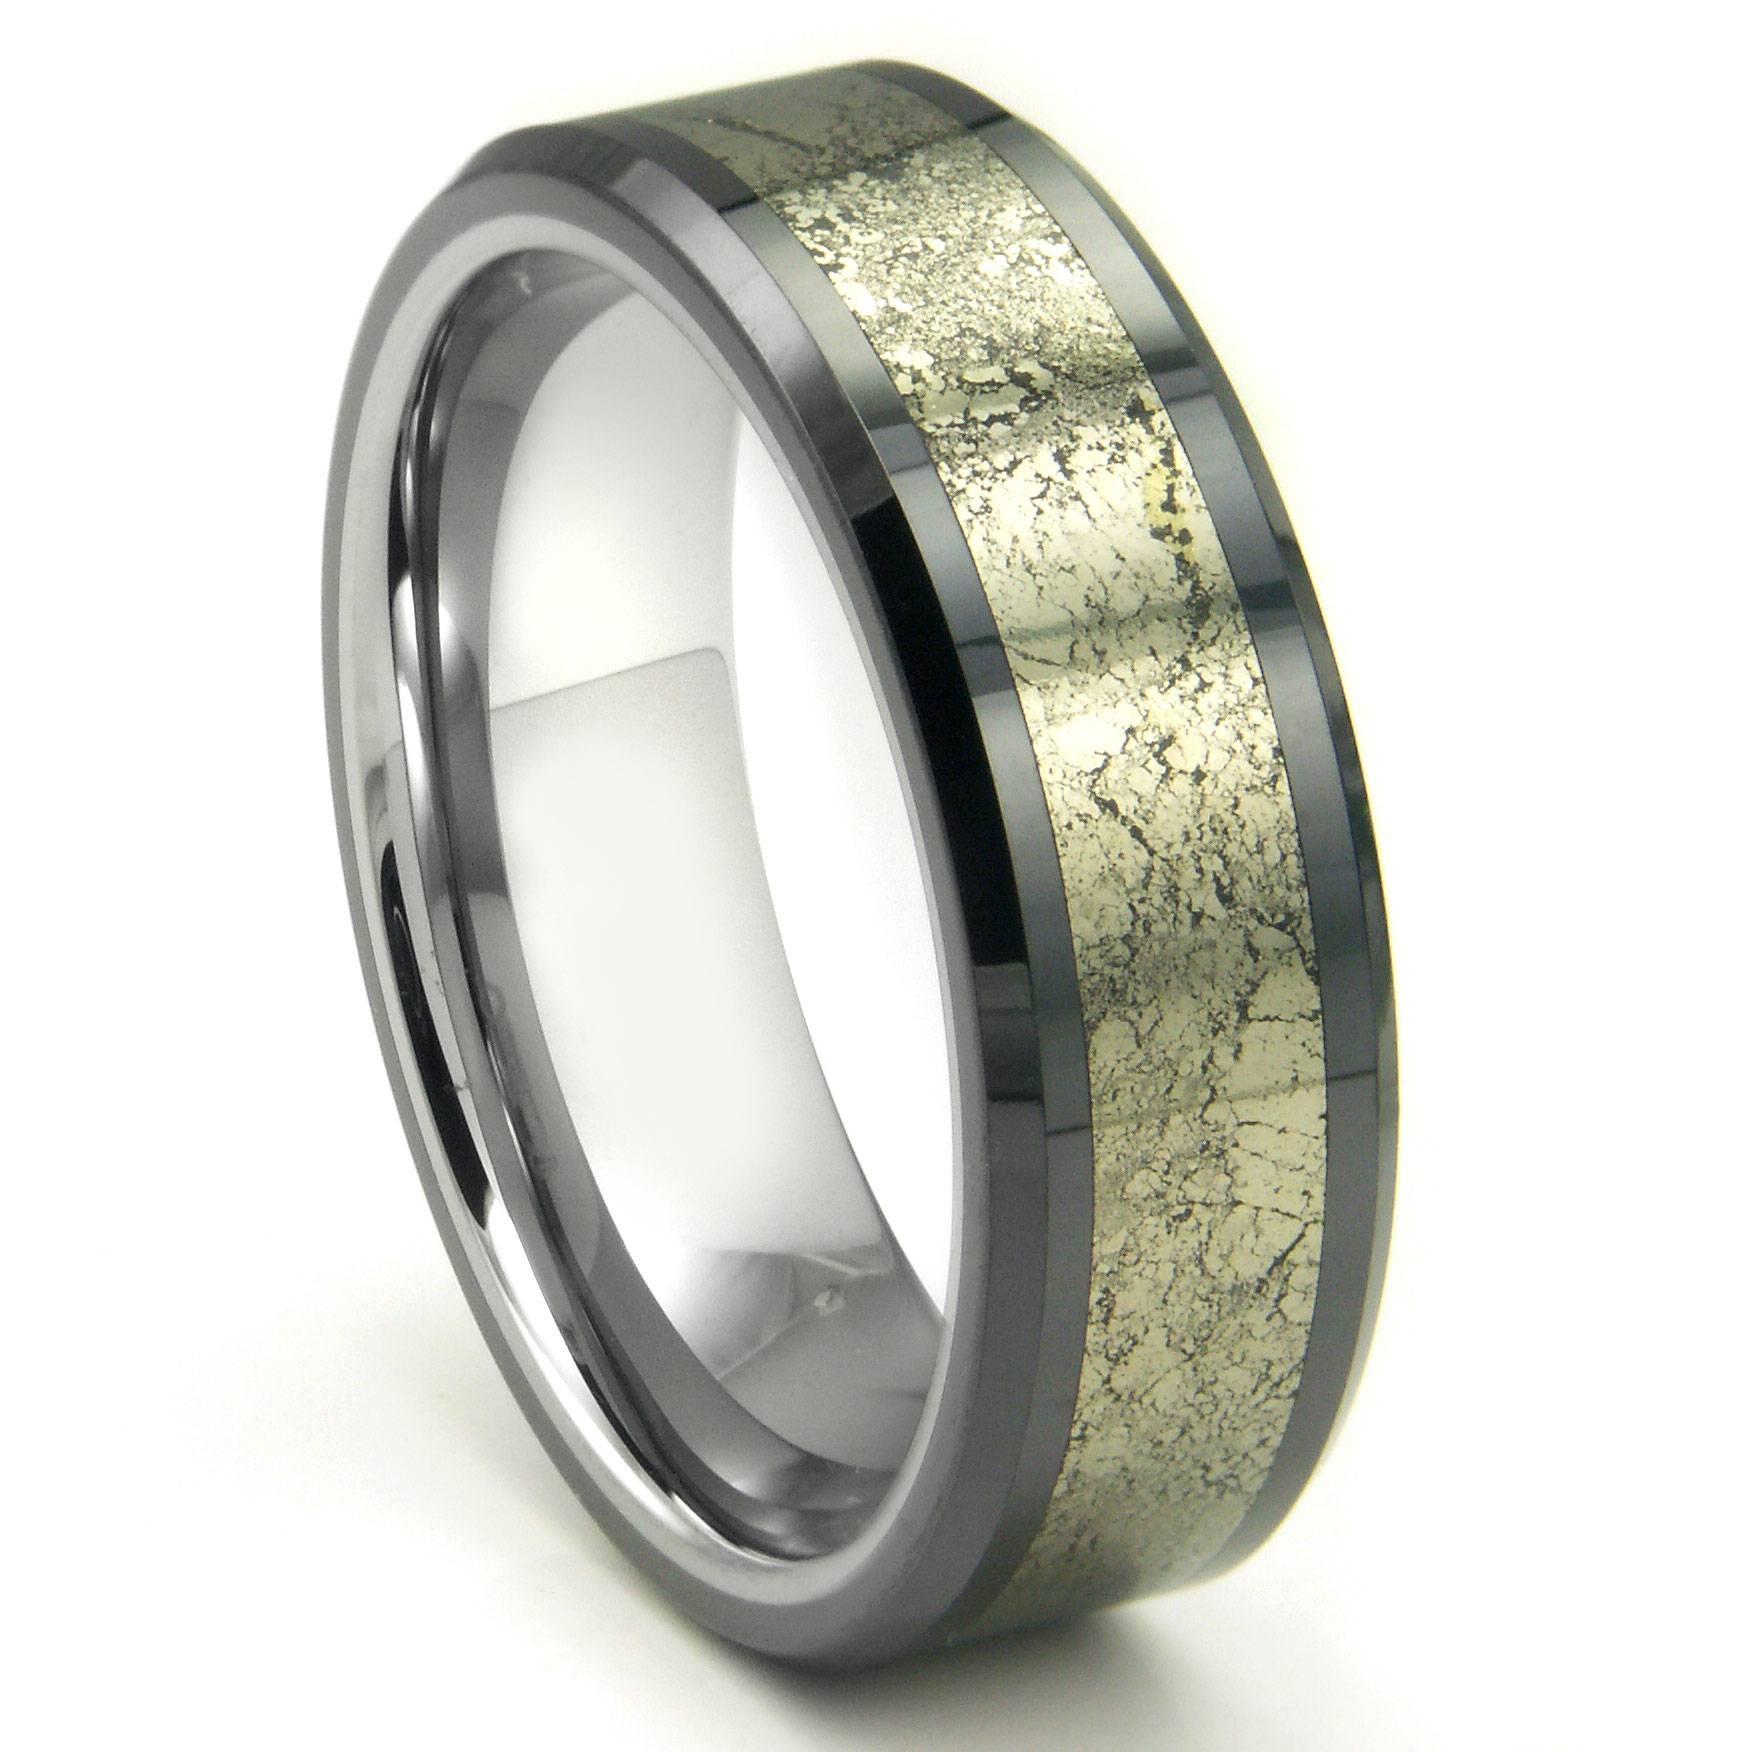 Wedding Rings : Mens Tungsten Wedding Bands Size 14 Striking Regarding Size 14 Men's Wedding Bands (View 10 of 15)